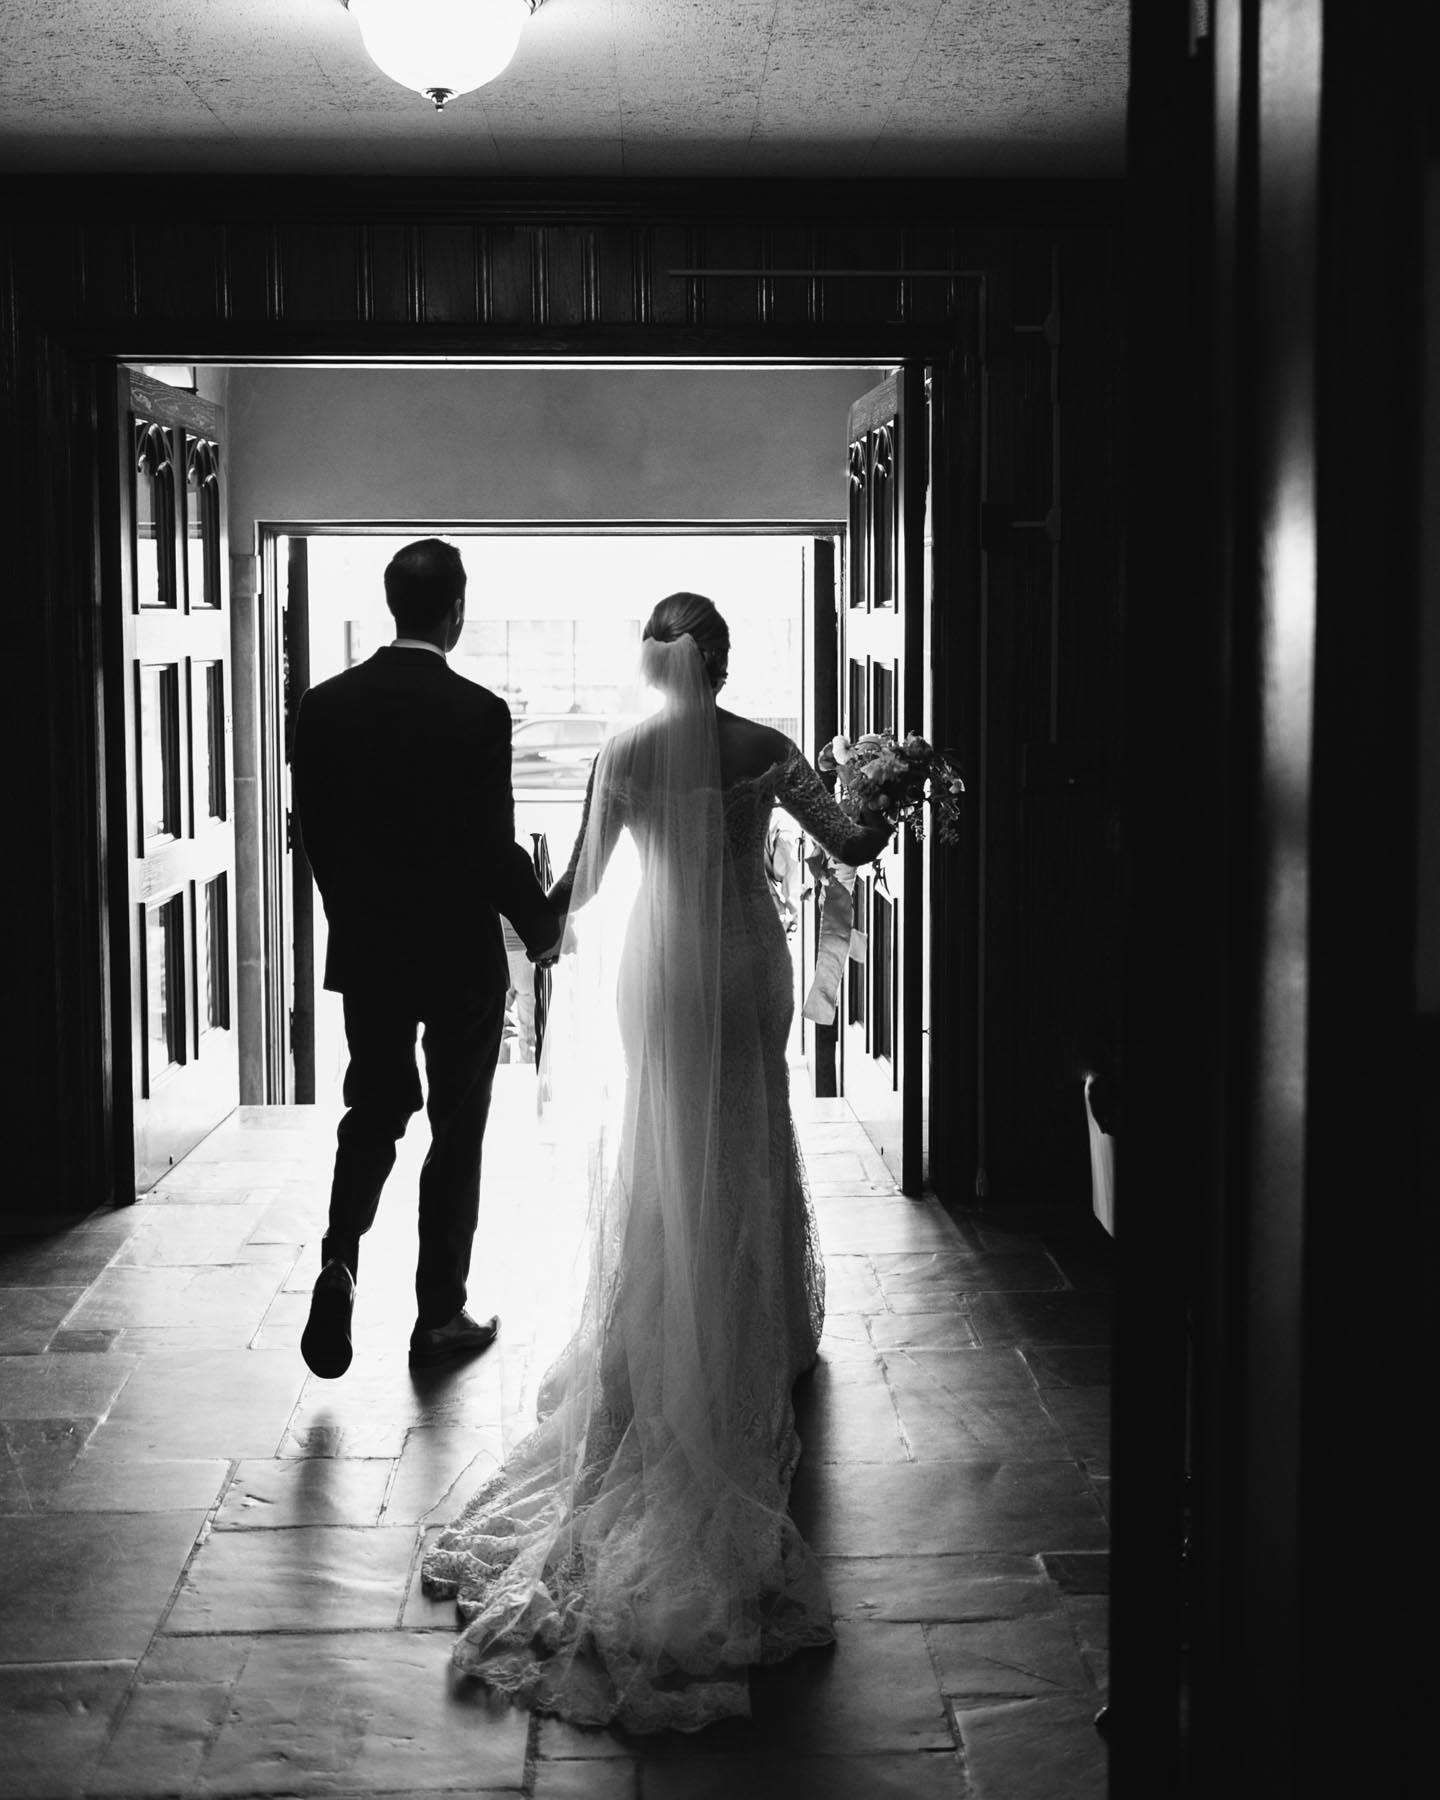 kjellman wedding blog biltmore wedding -86